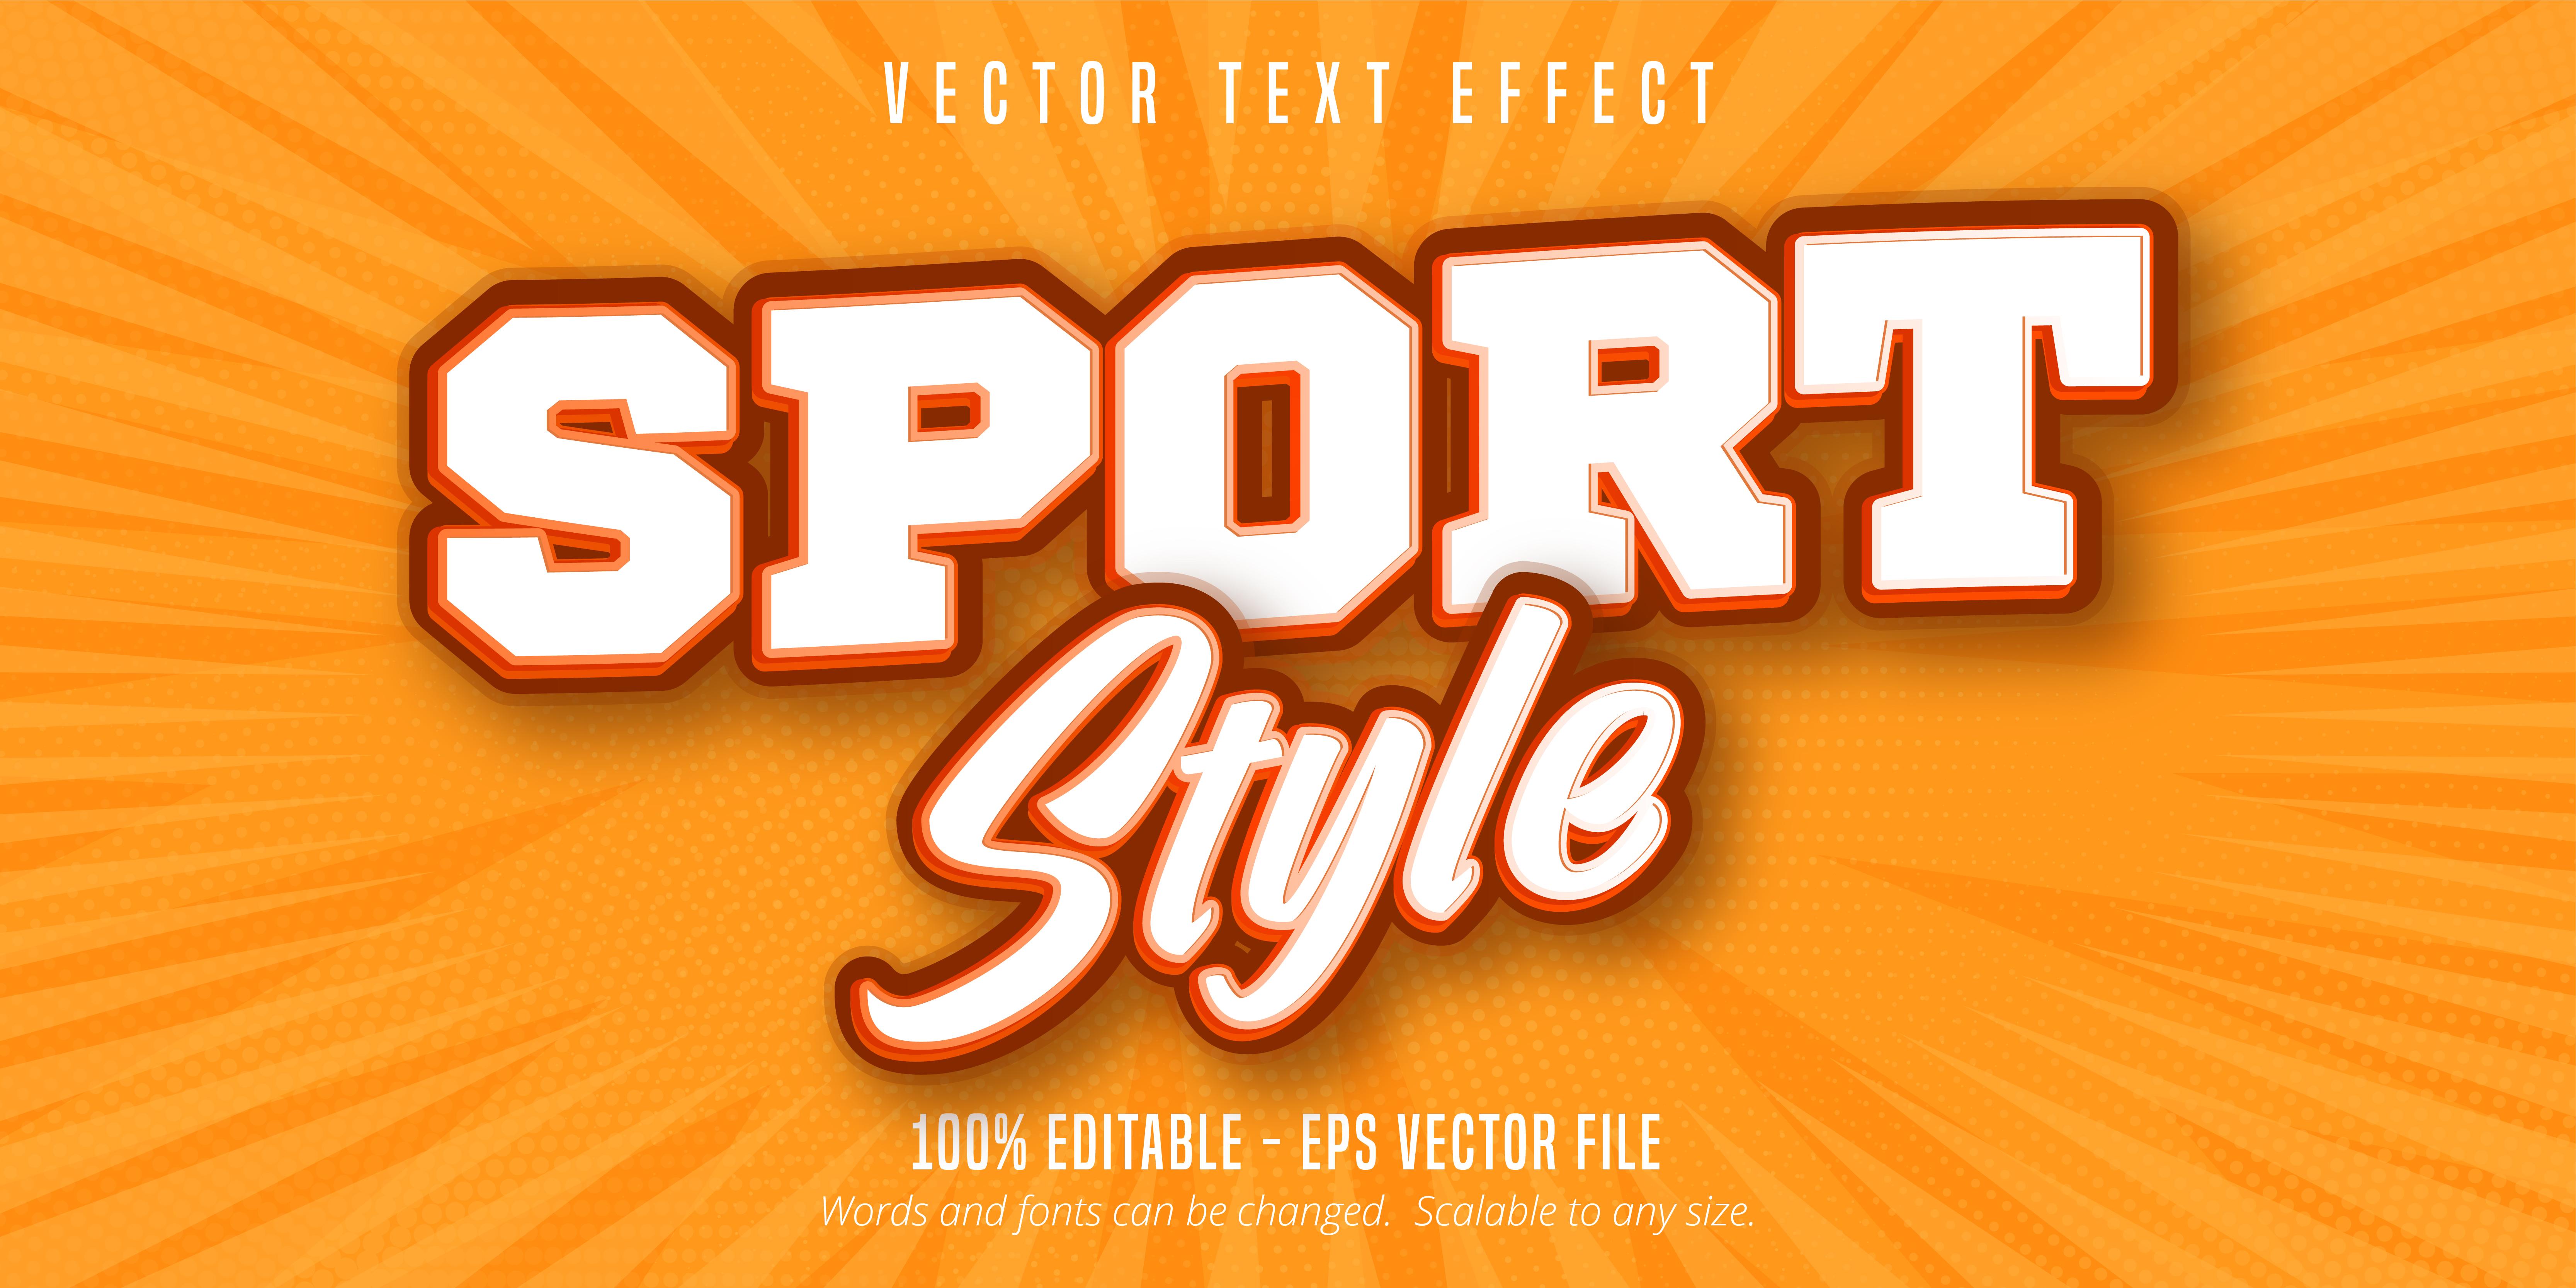 texto de estilo deportivo, efecto de texto de estilo pop art